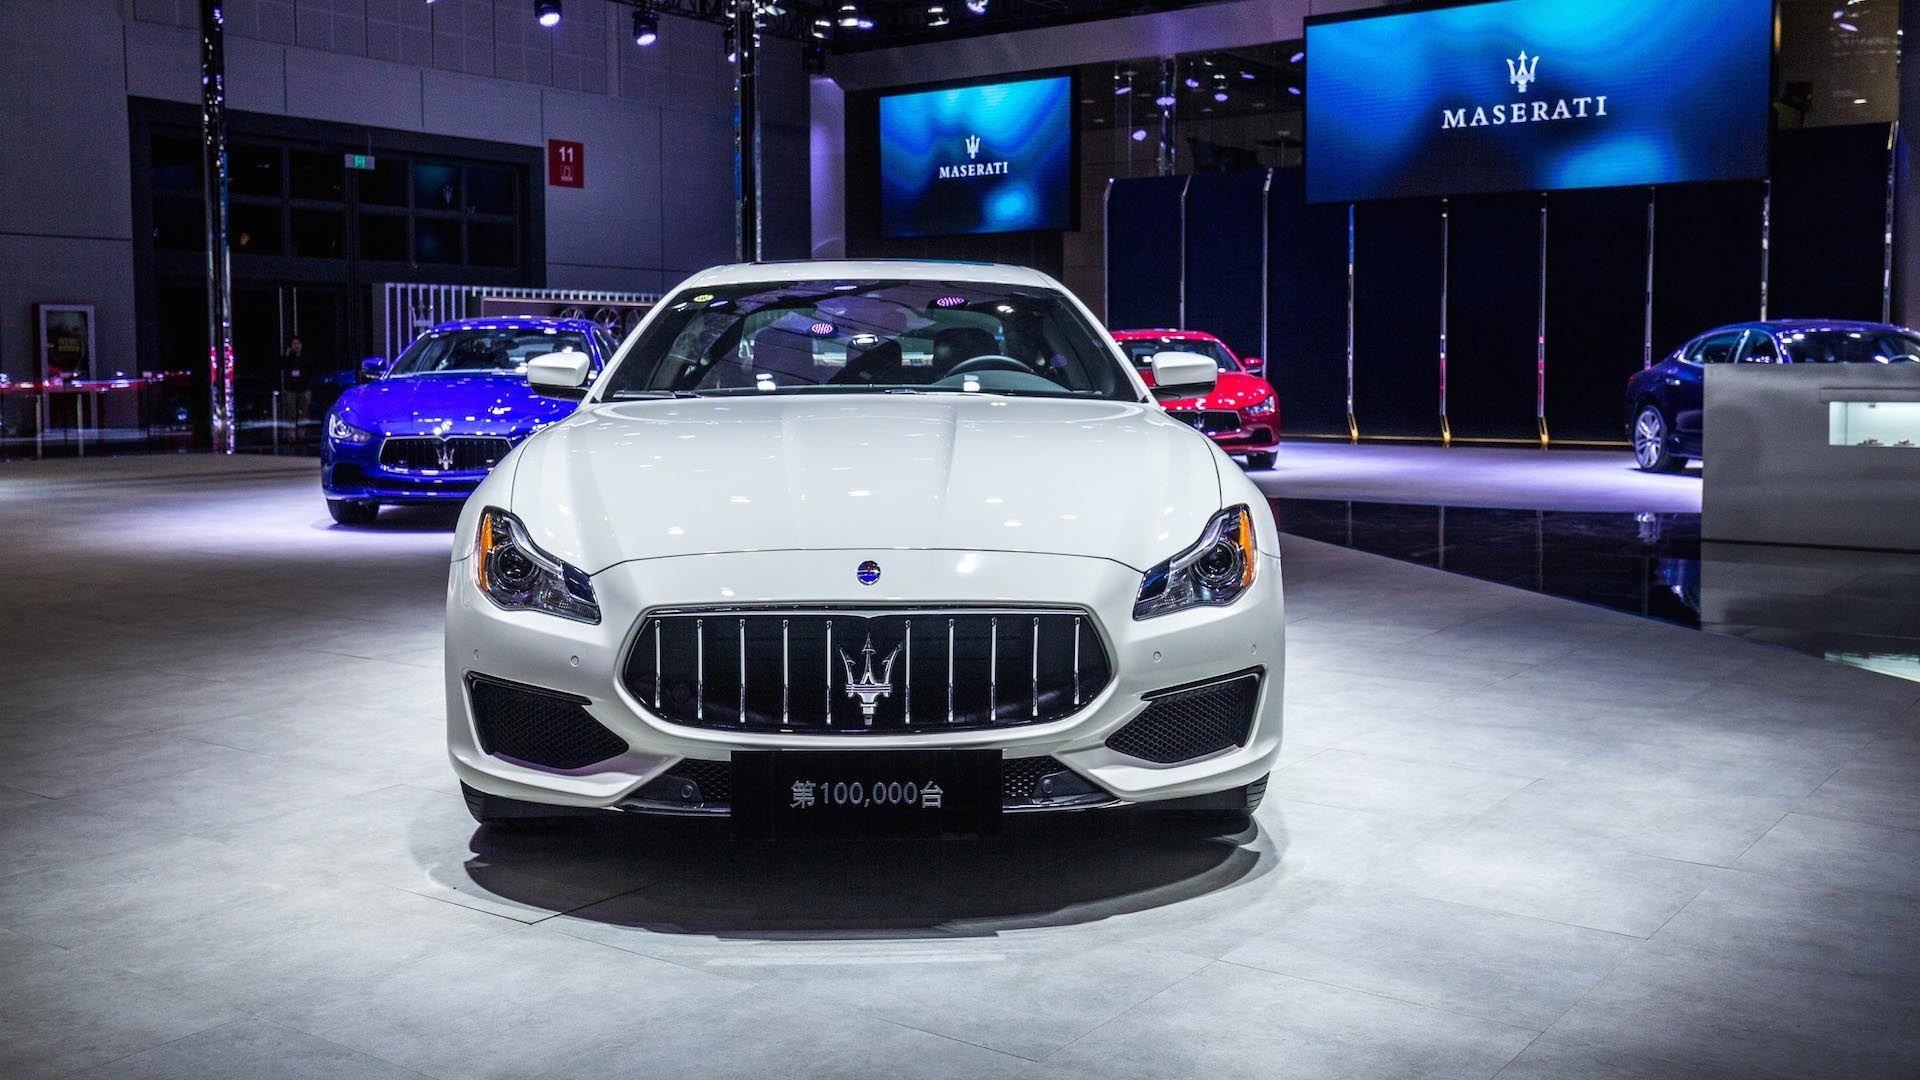 Maserati celebrated the milestone delivery of its 100,000th car